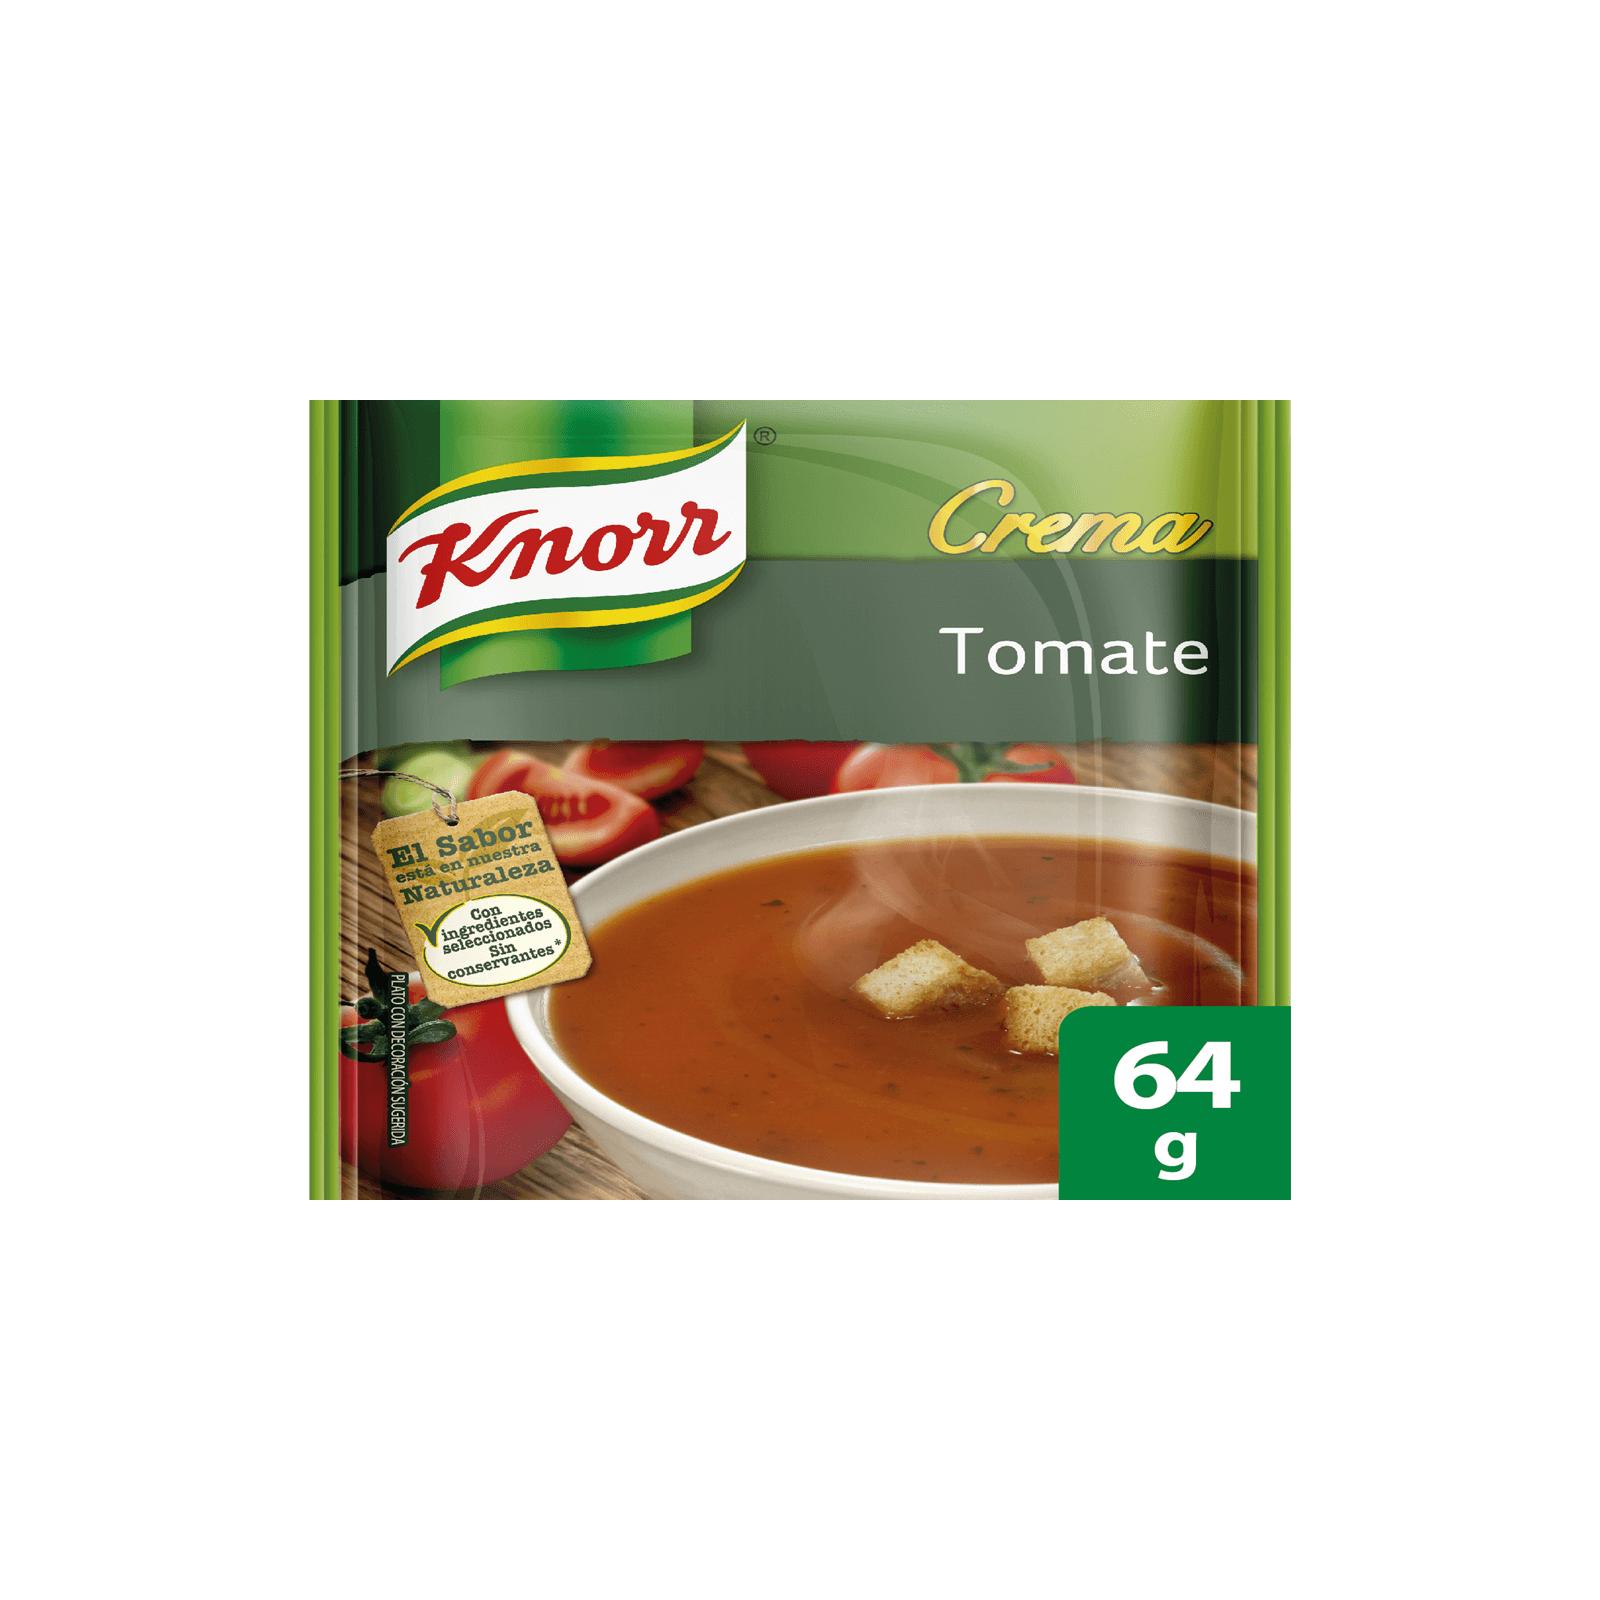 Crema De Tomate Knorr